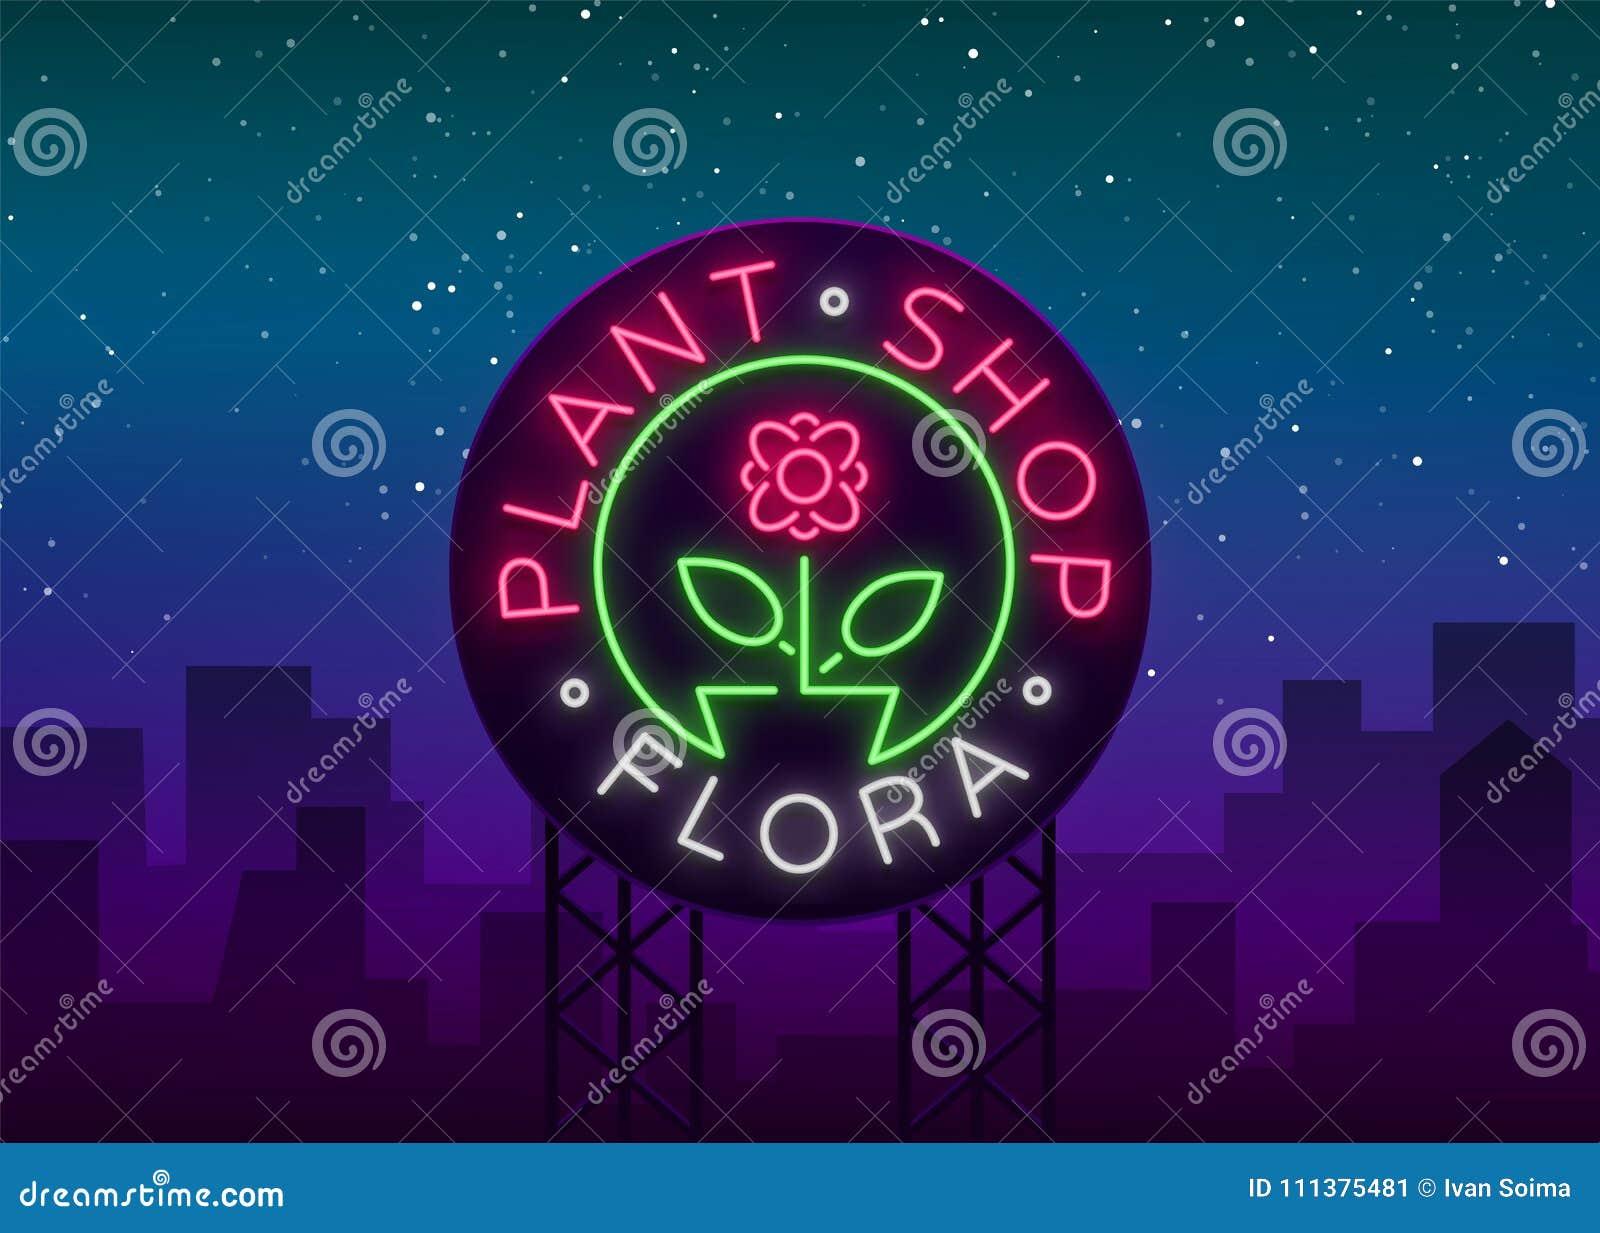 Flower shop plants florist flora emblem sign neon logo flower shop plants florist flora emblem sign neon logo template design element for business vivid advertising buycottarizona Choice Image